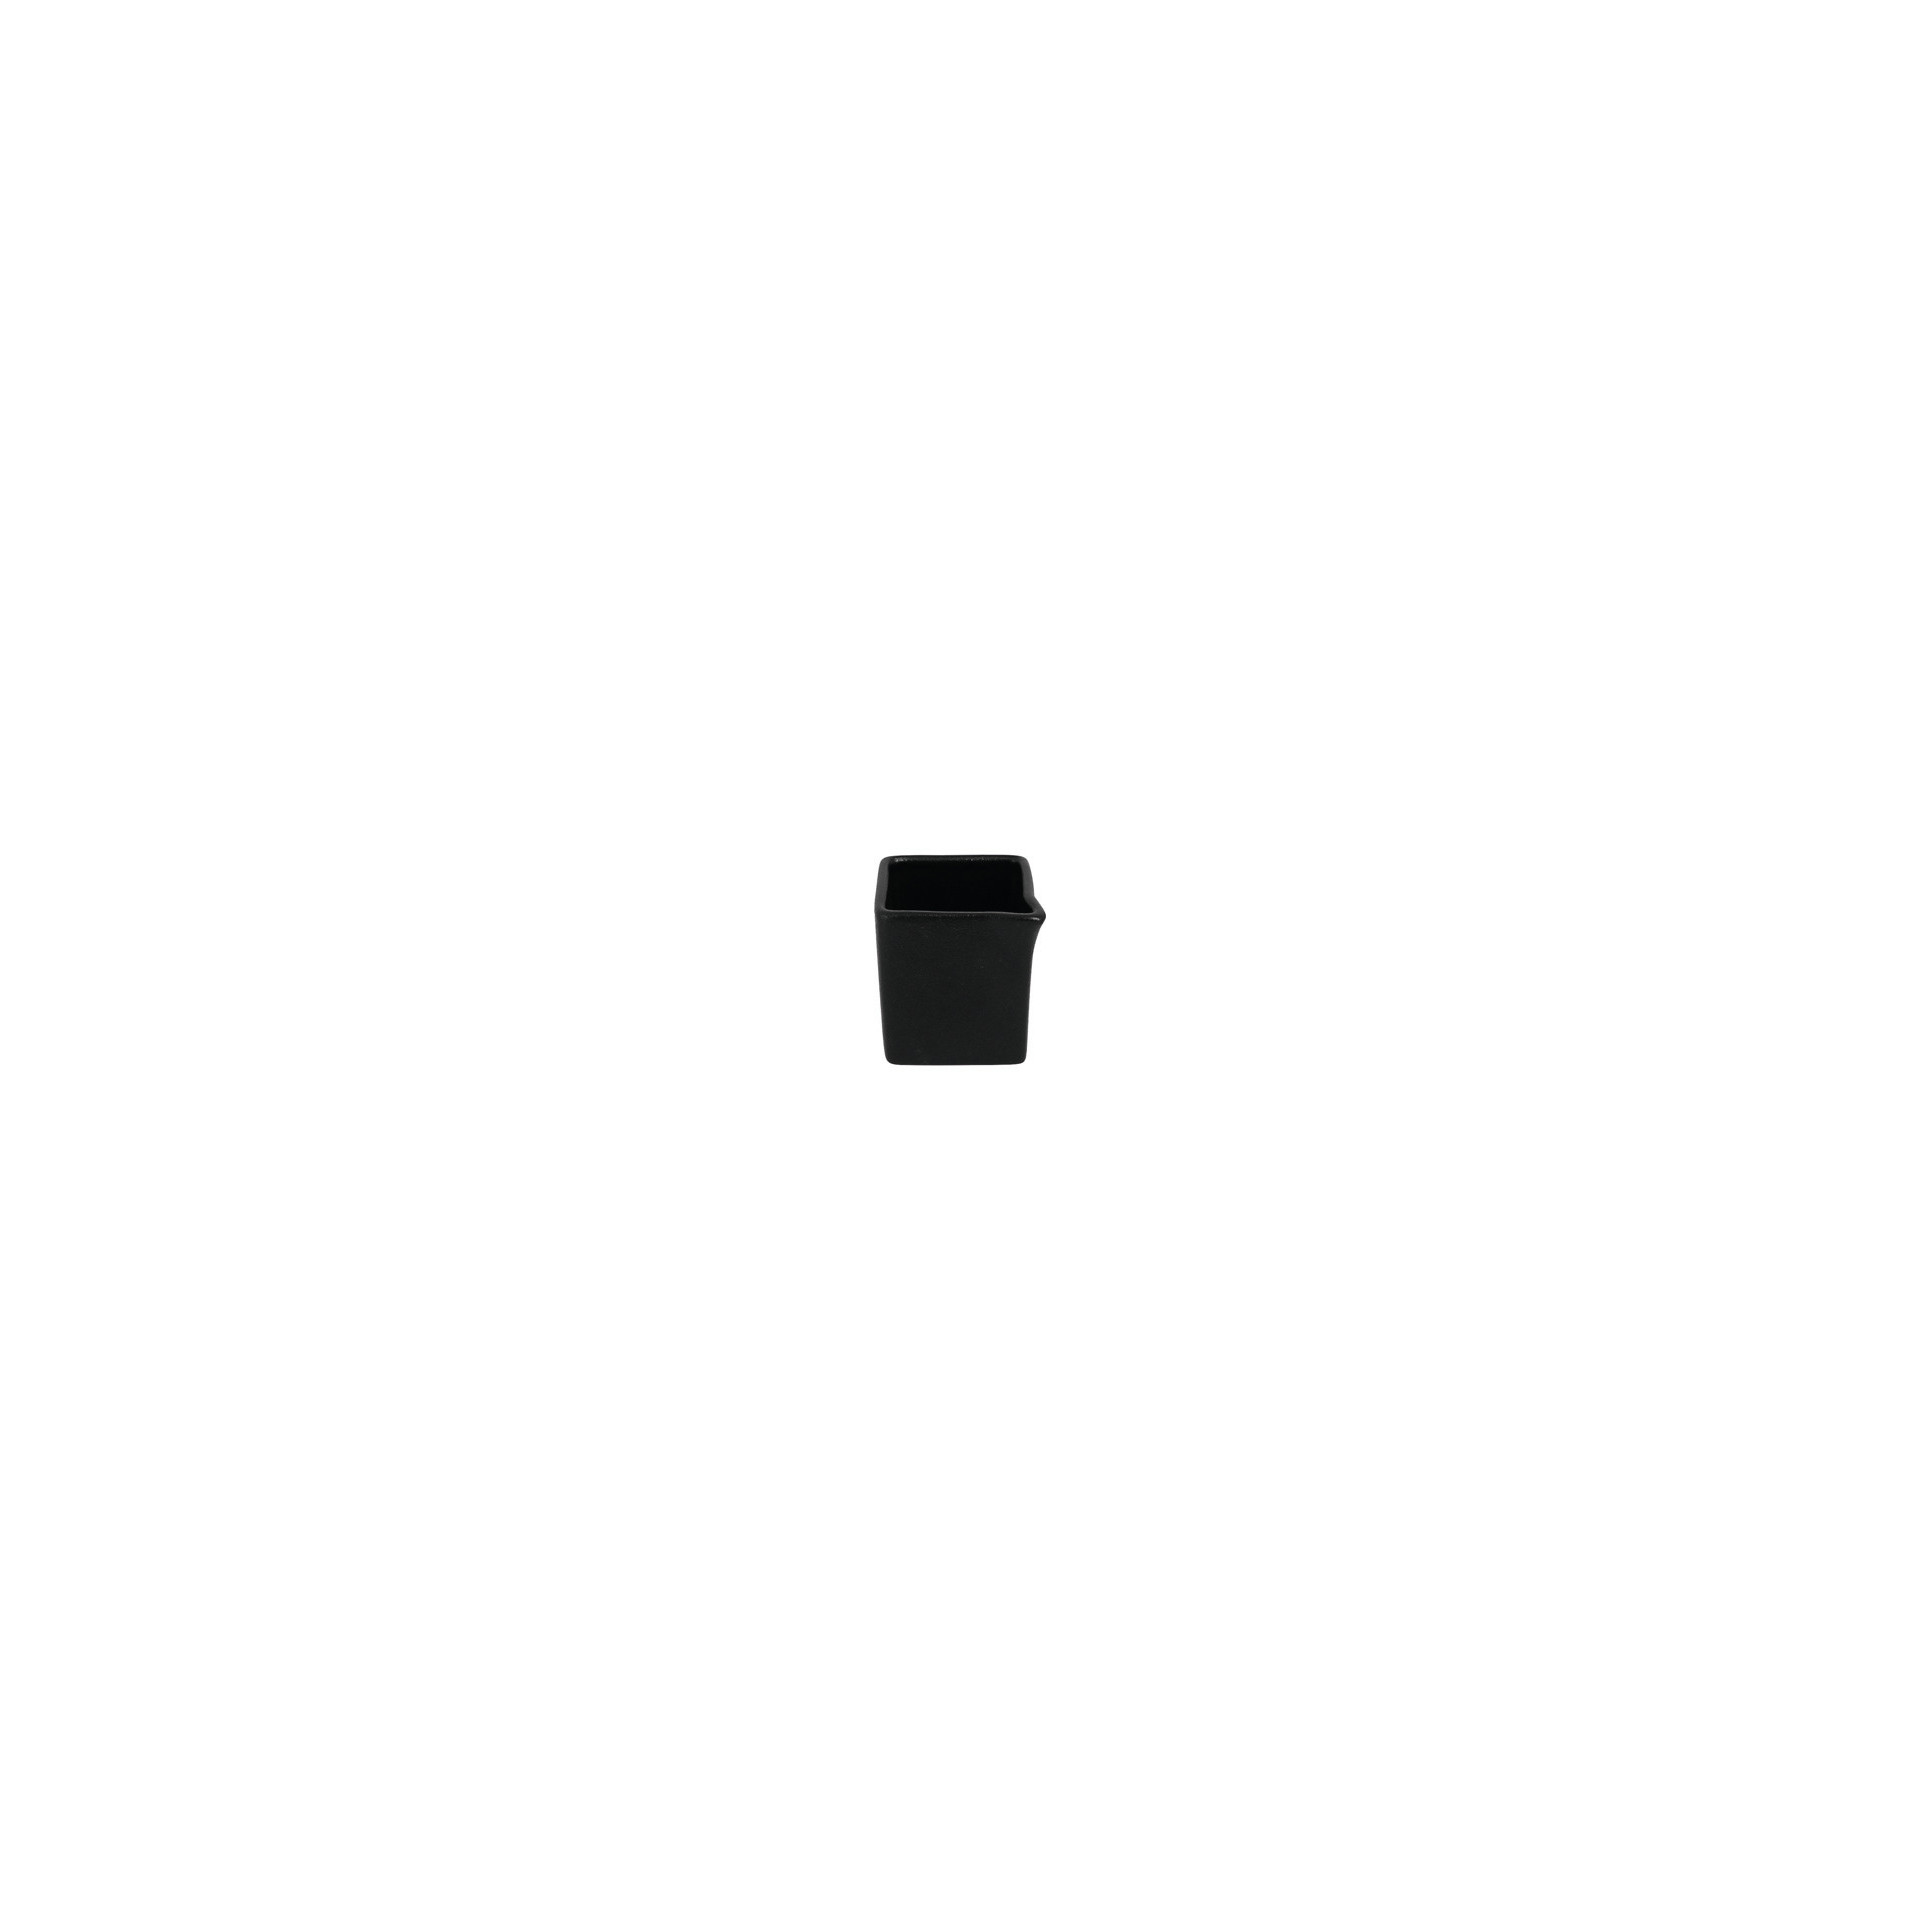 Neofusion, Sauciere / Milchkännchen quadratisch 53 x 53 x 58 mm / 0,08 l volcano